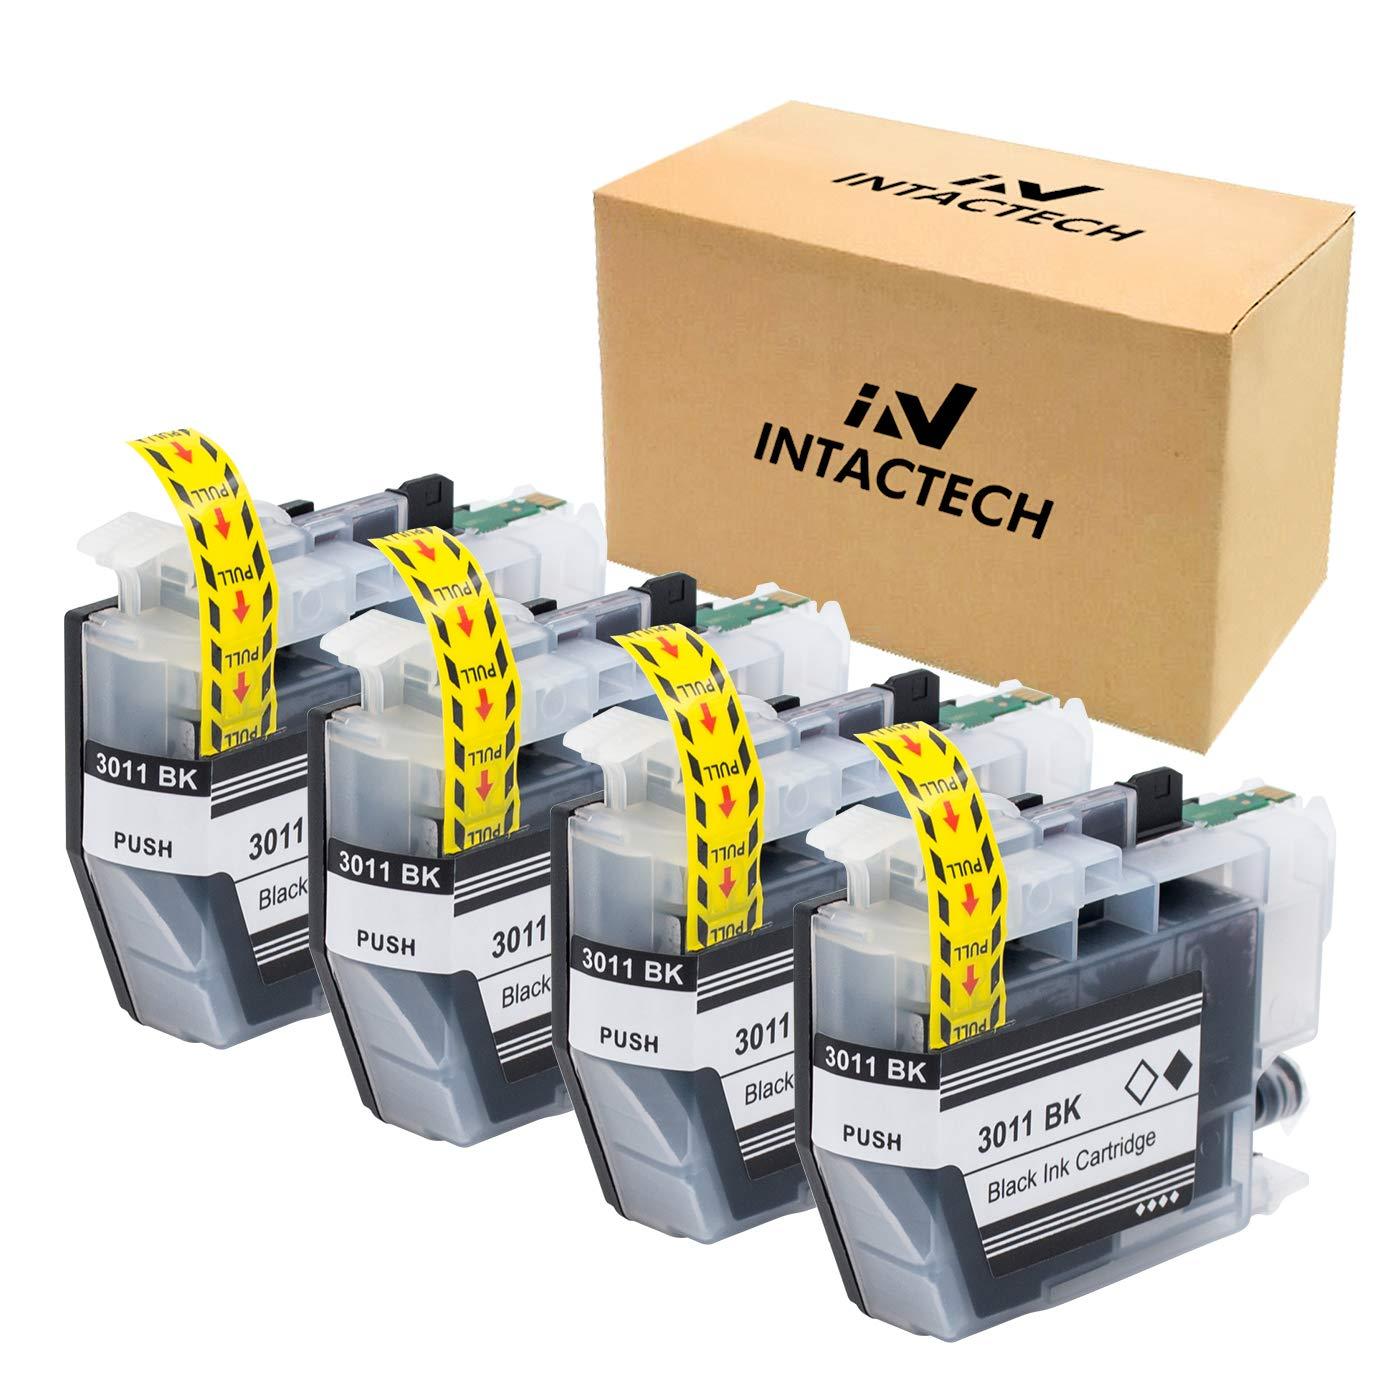 Amazon.com: Intactech - Cartuchos de tinta para impresora de ...